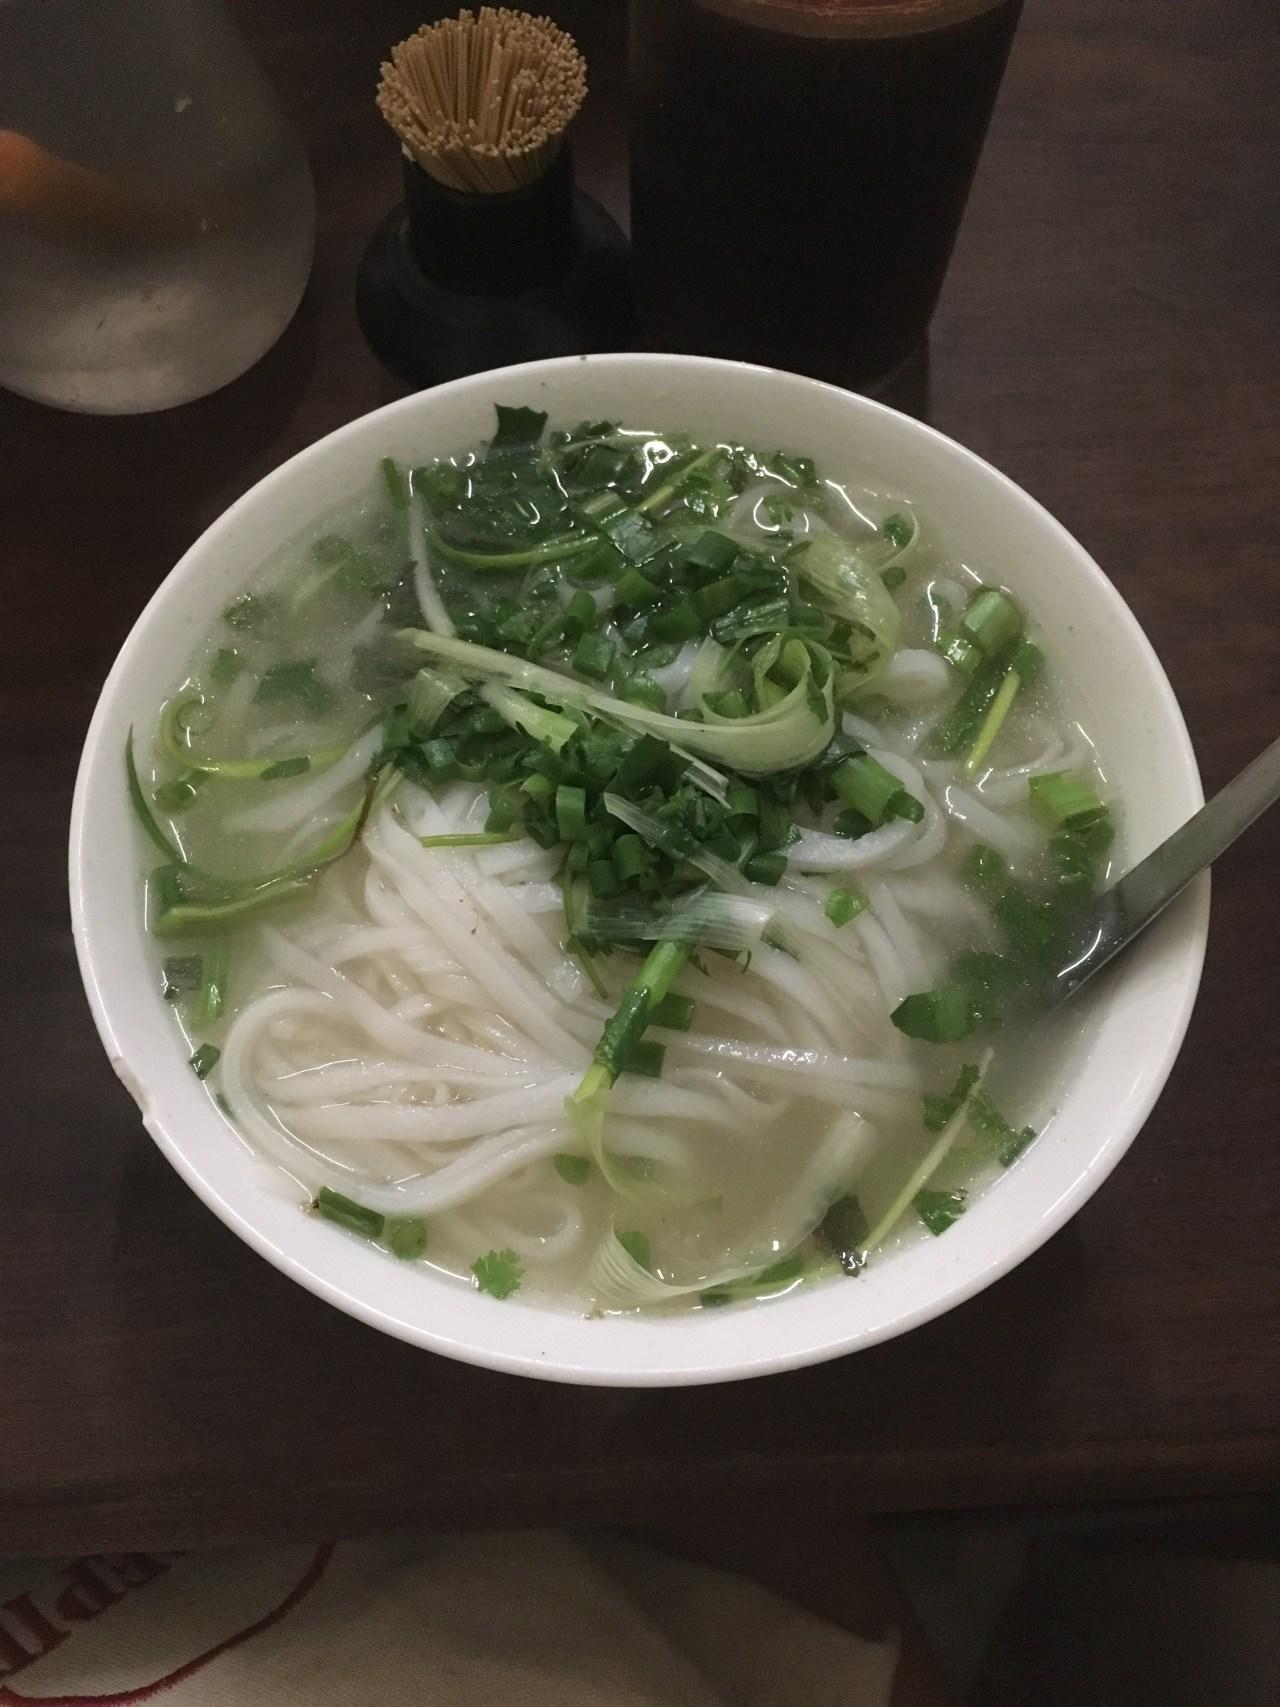 Noodles for breakfast